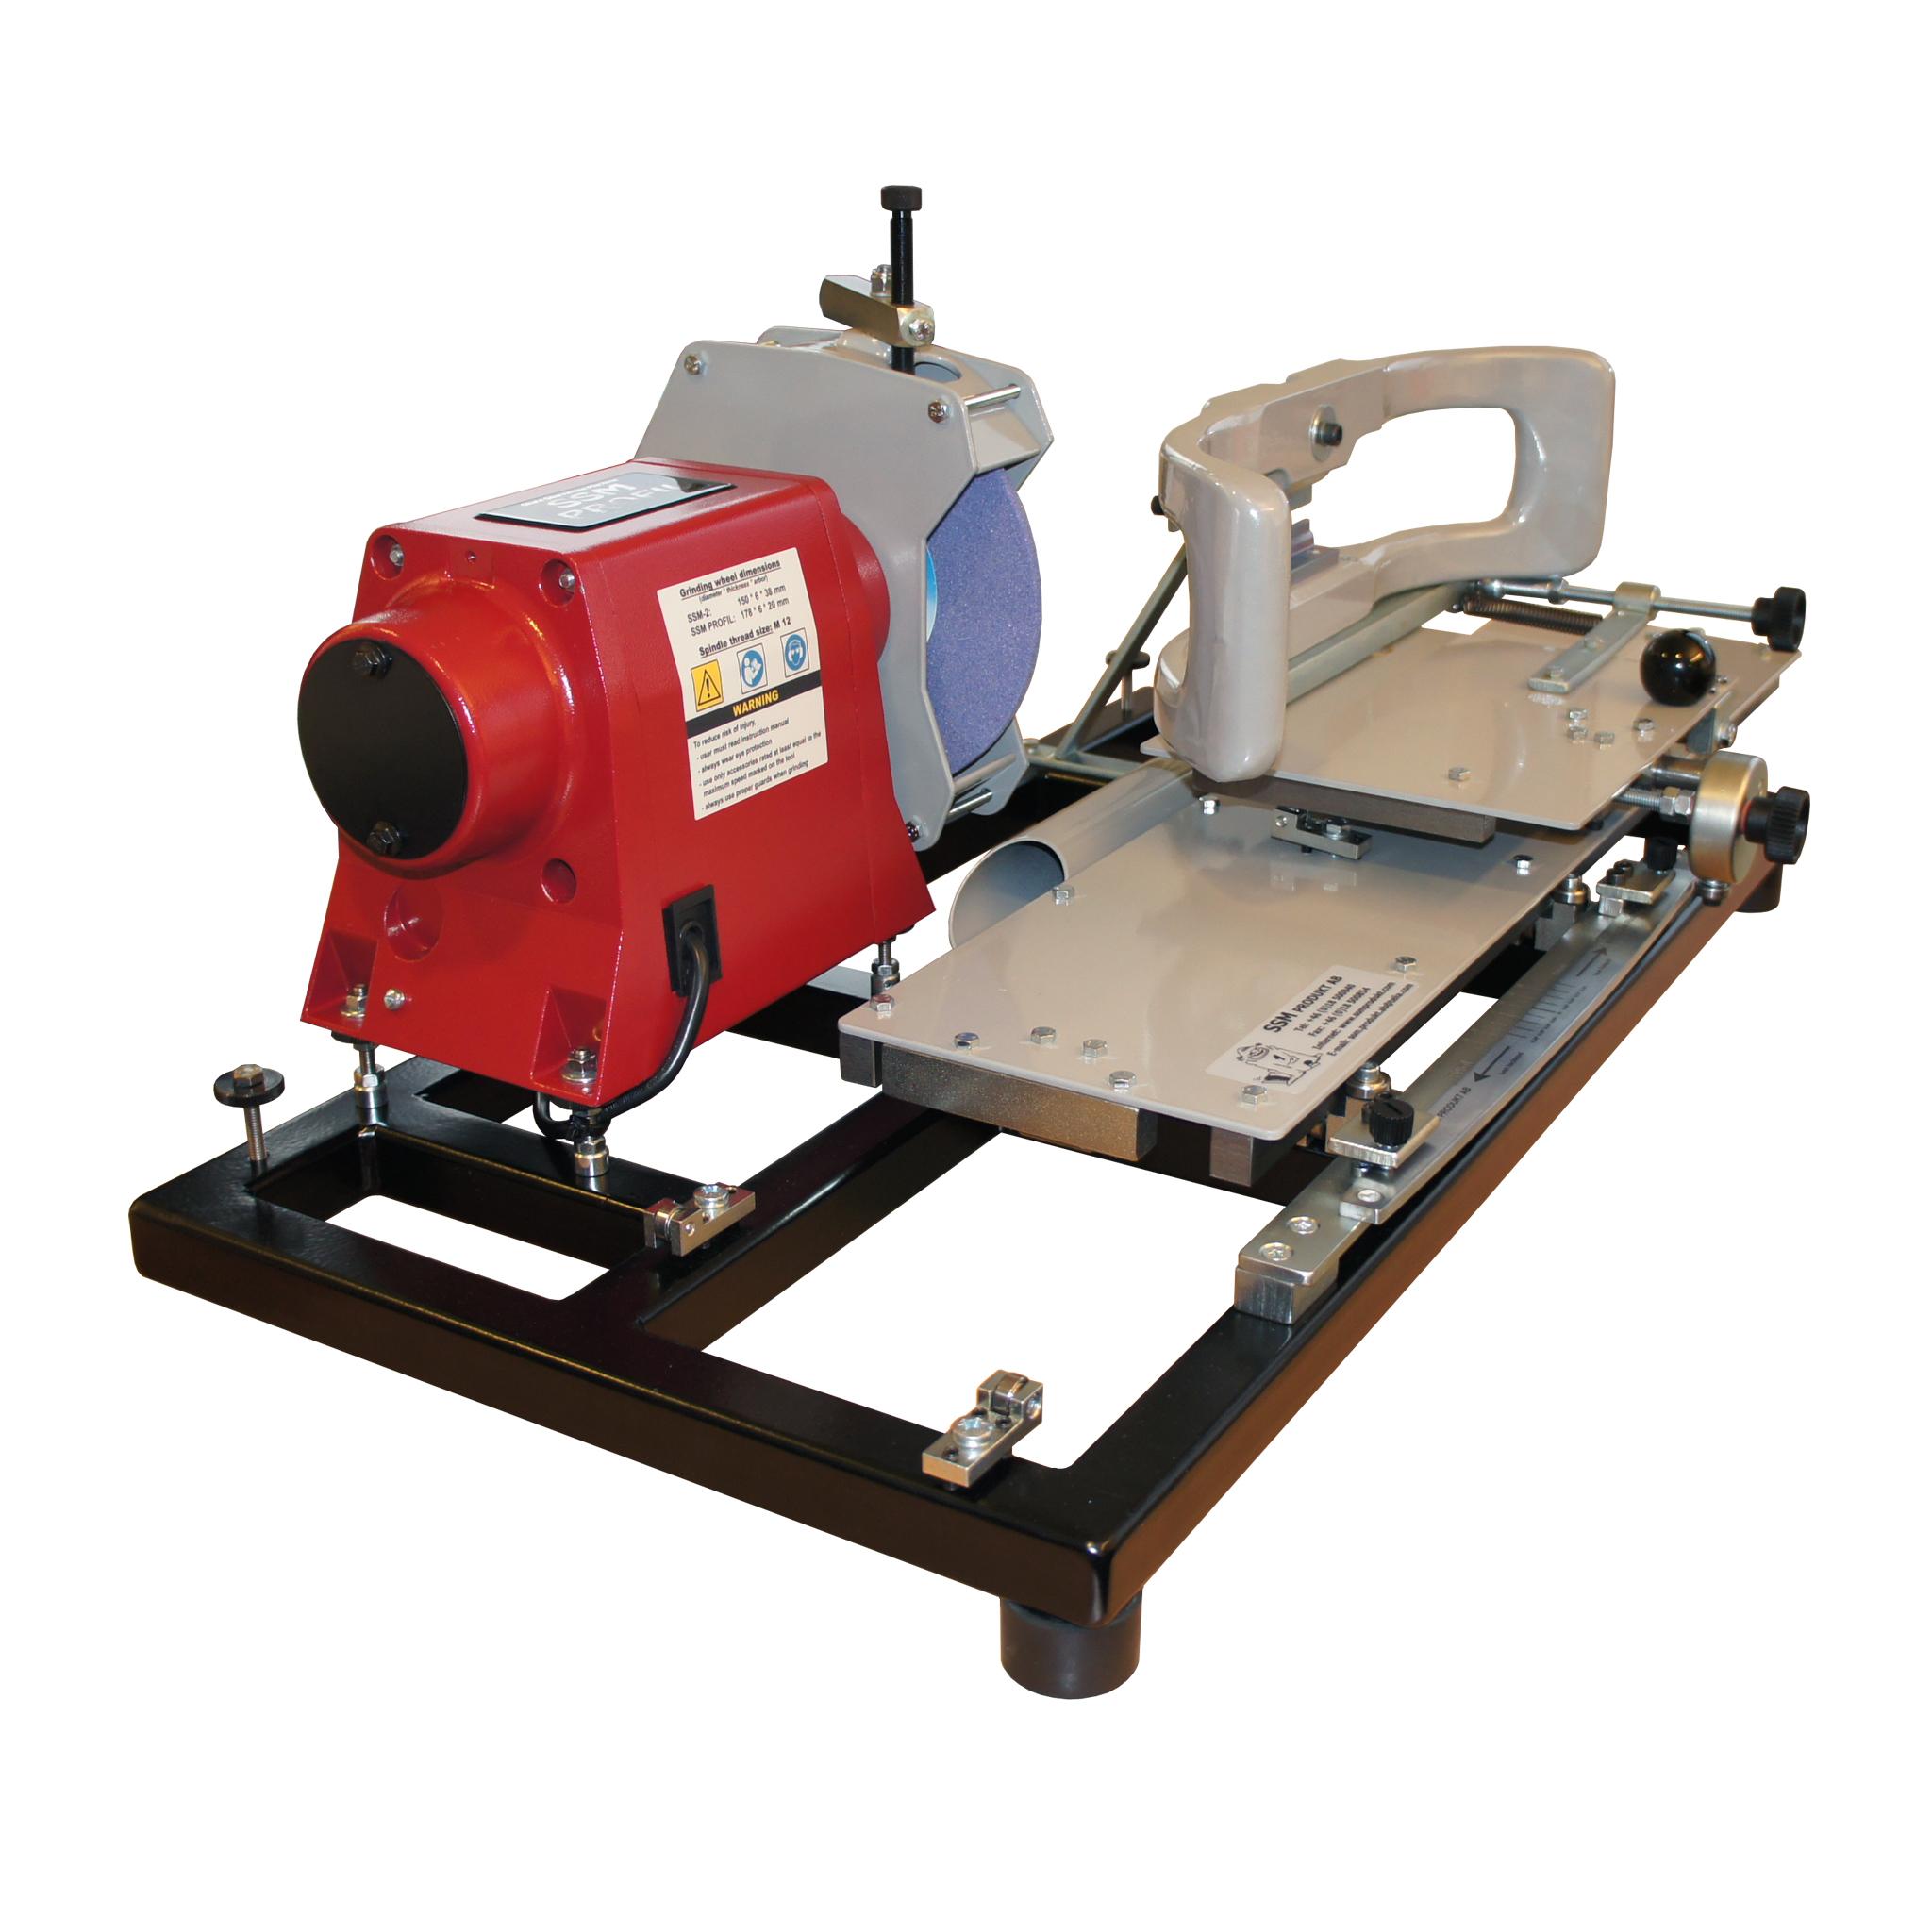 SSM PROFIL skate sharpening machine